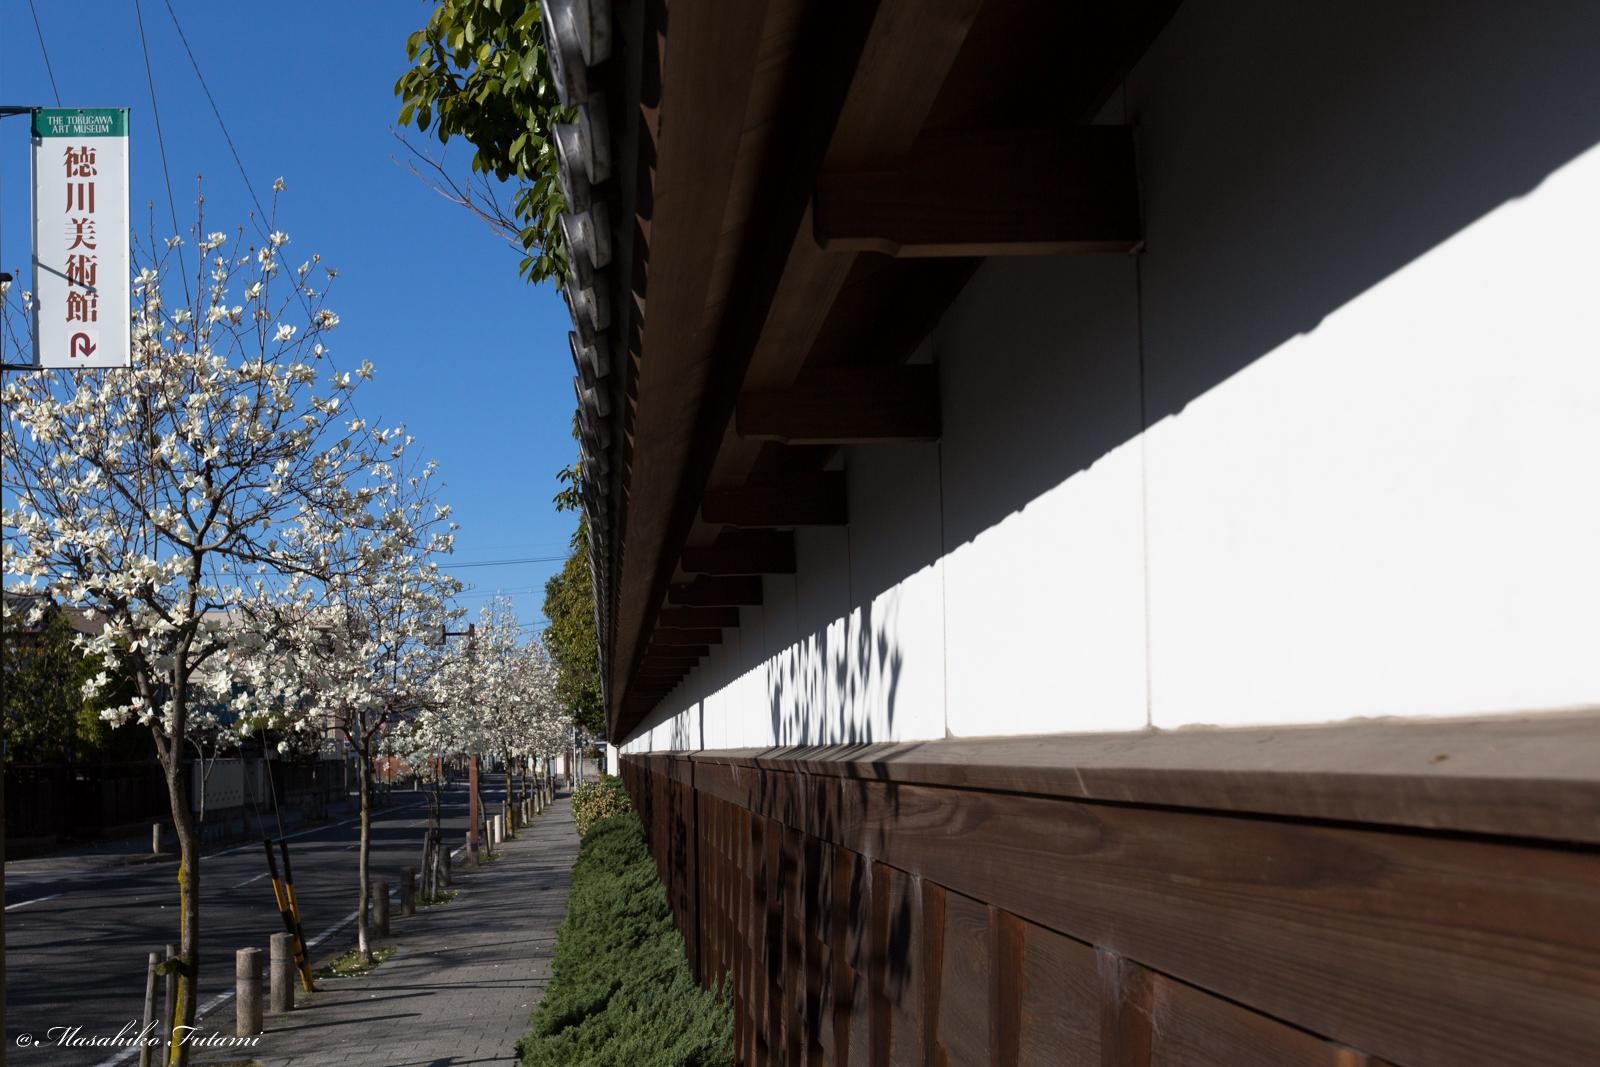 Magnolia Blossom and Tokugawa Art Museum